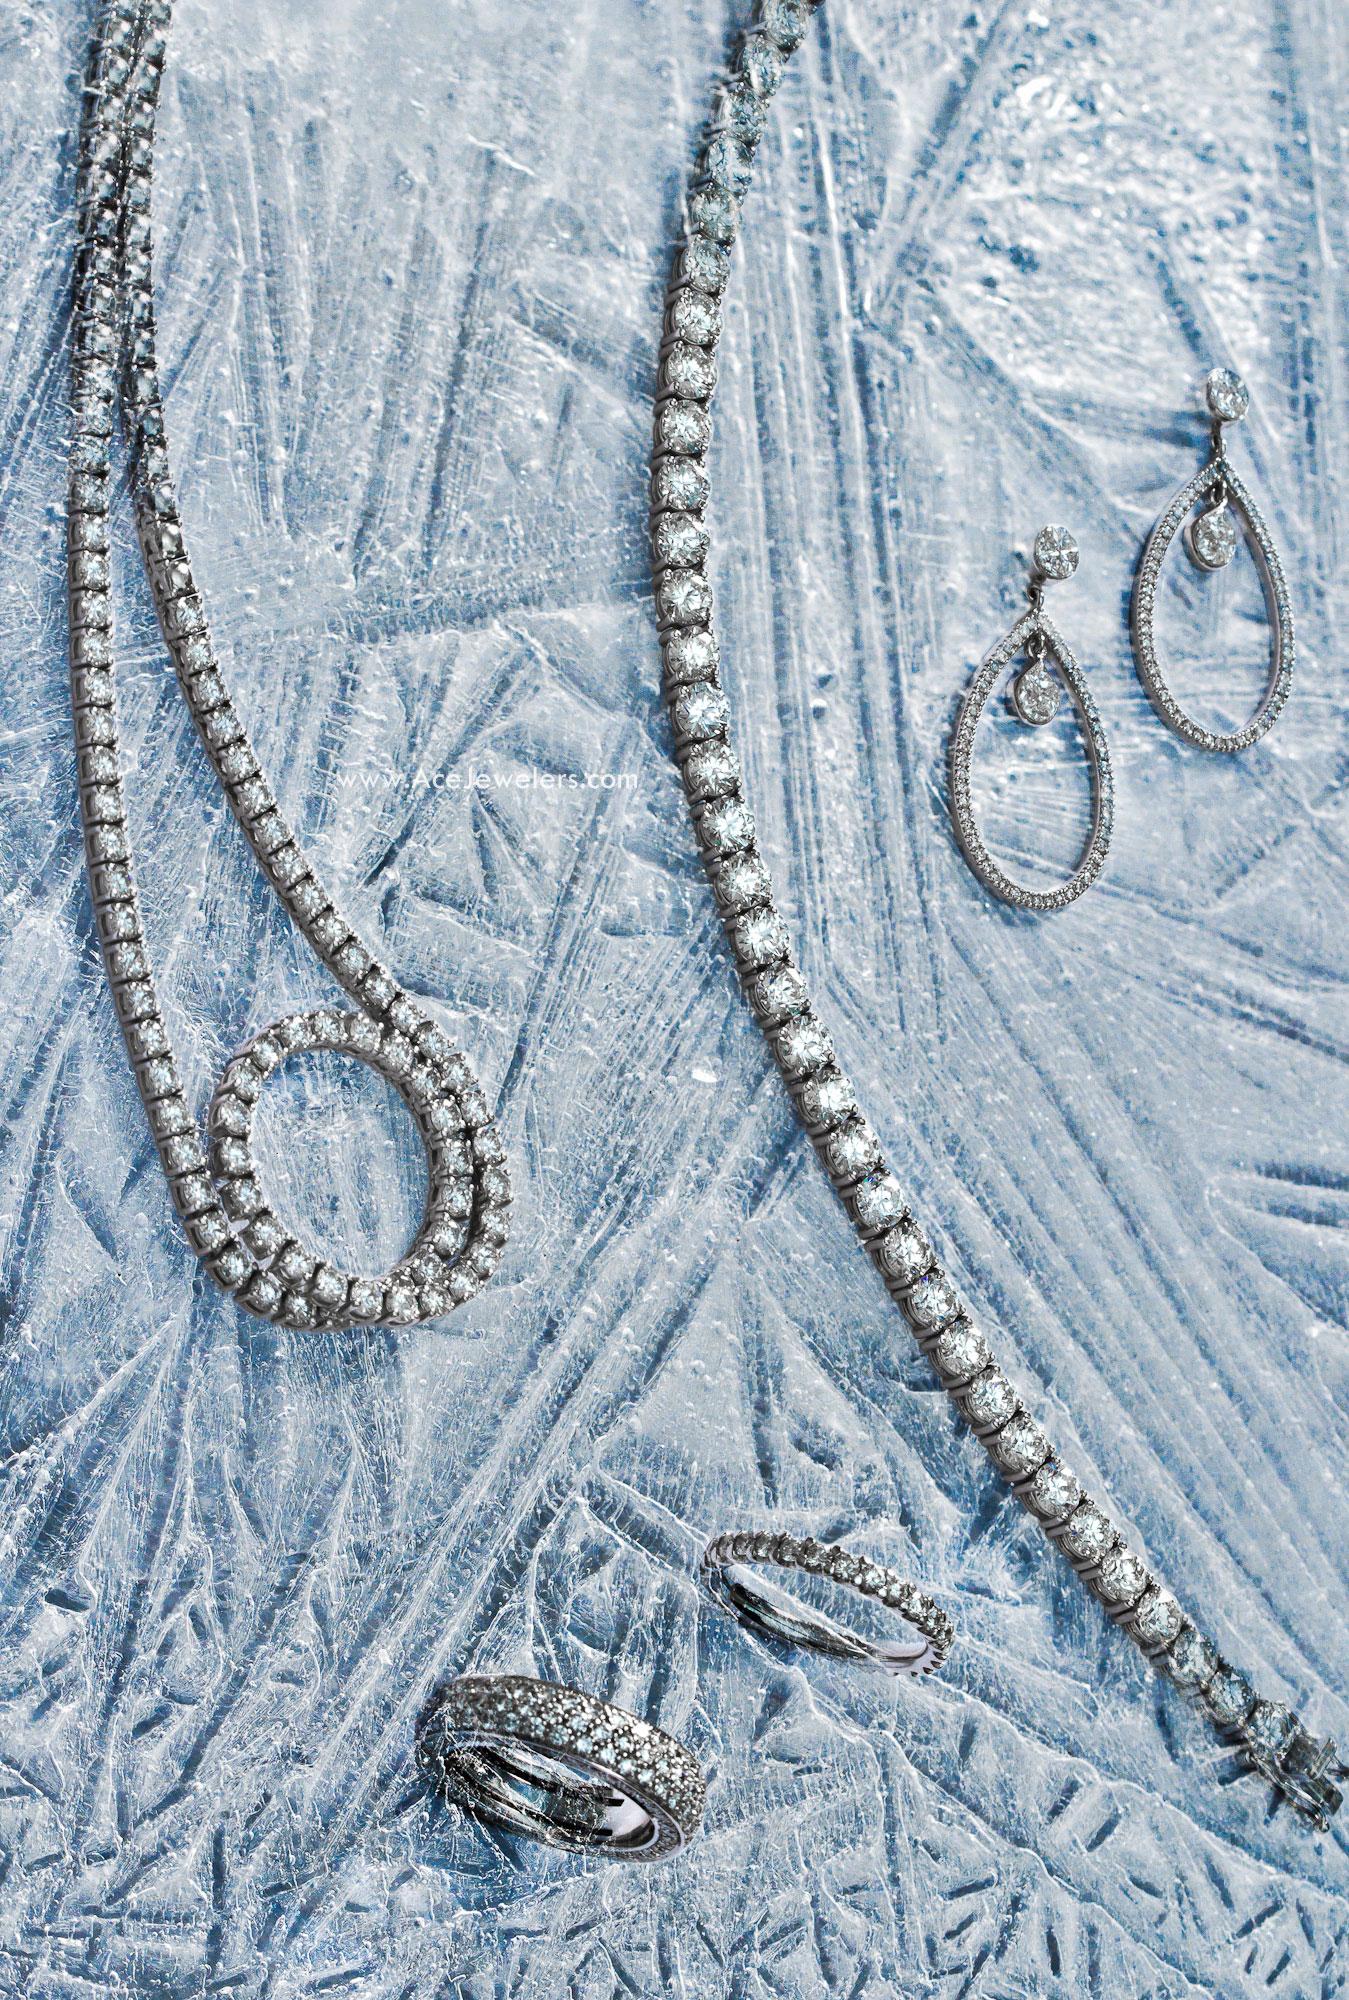 0024-ace-fine-jewelry-ice-5